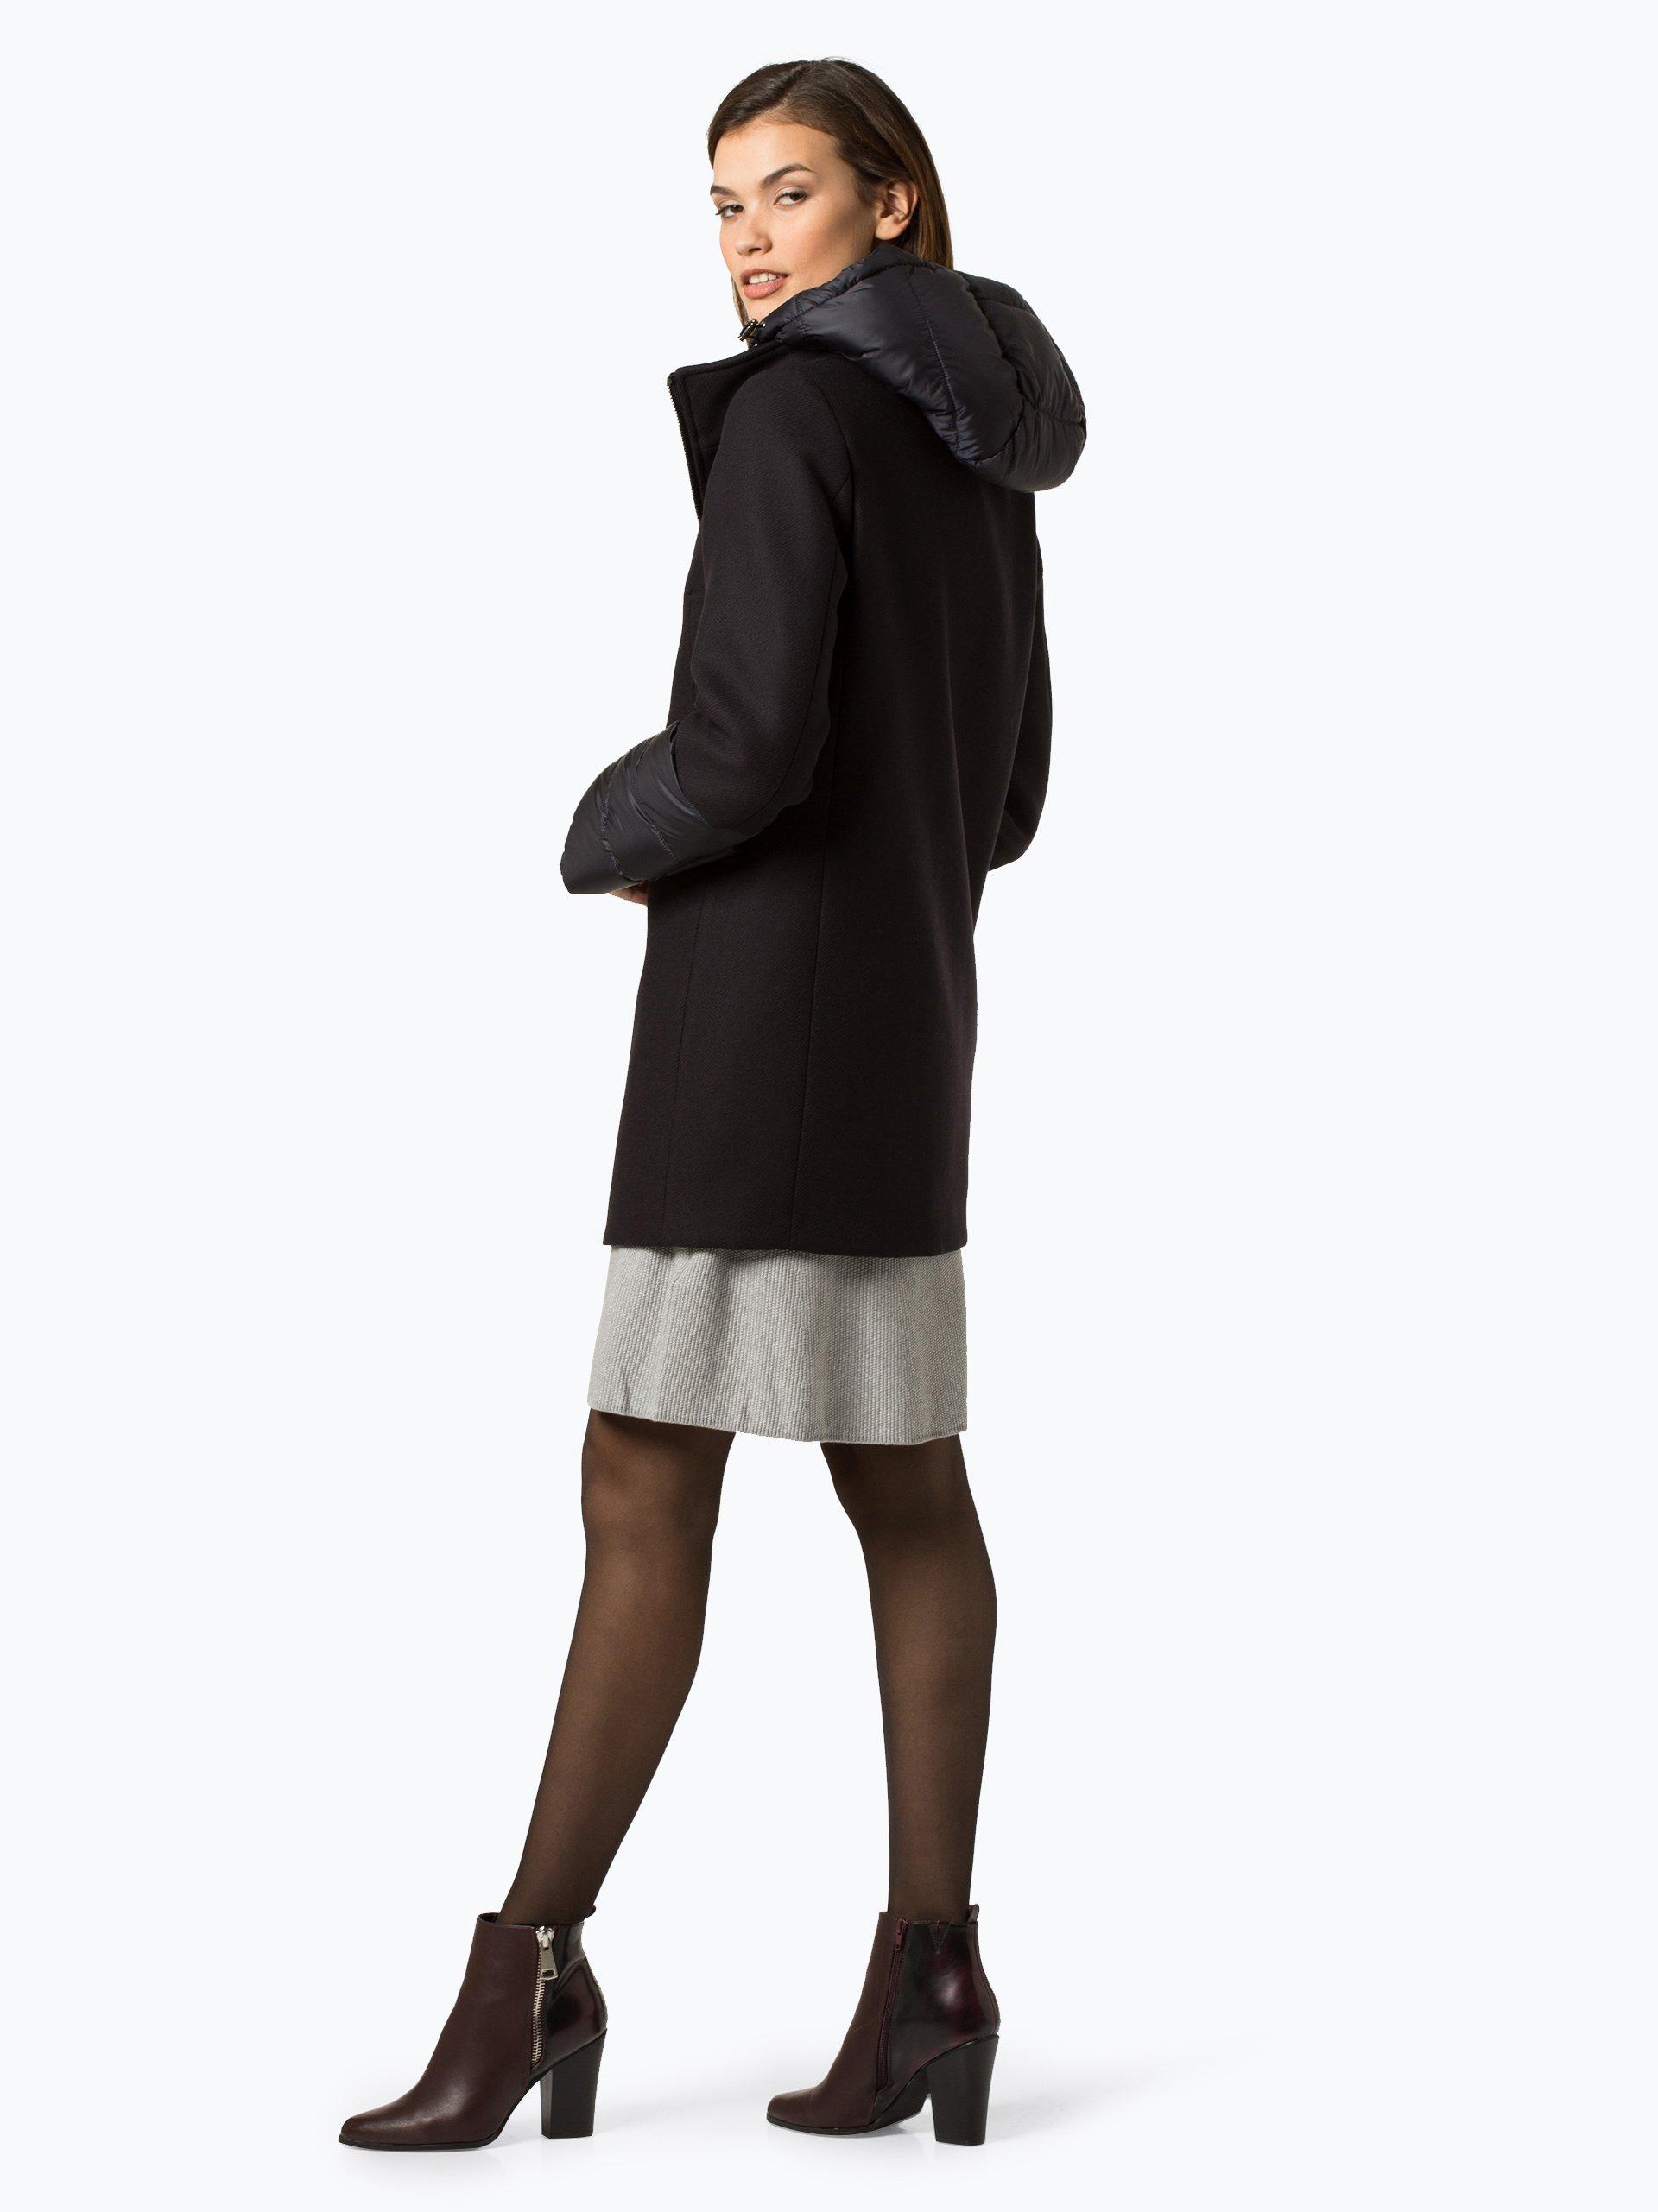 jan mayen damen mantel mit cashmere anteil salice marine uni online kaufen vangraaf com. Black Bedroom Furniture Sets. Home Design Ideas